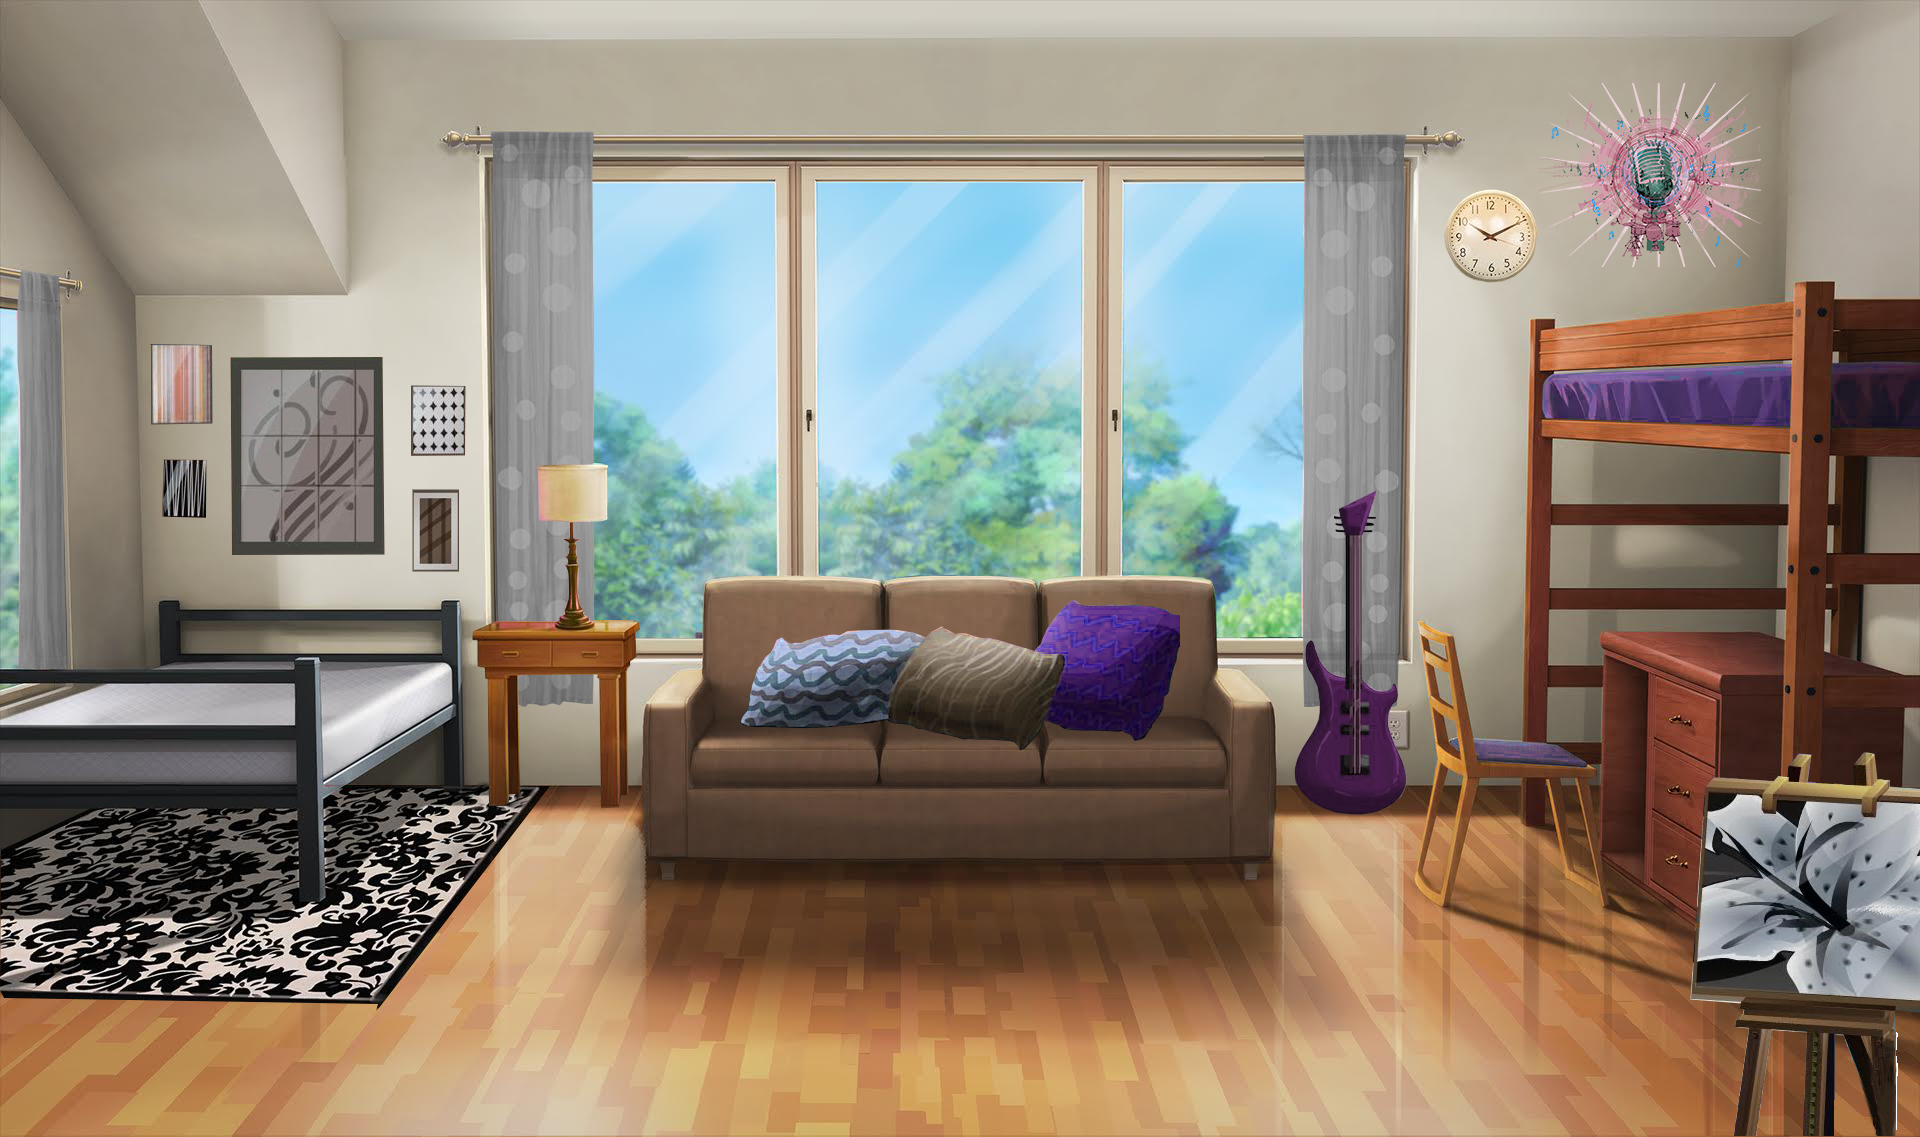 Int Dorm Room Guitar Day Fancy Living Rooms Episode Interactive Backgrounds Living Room Background